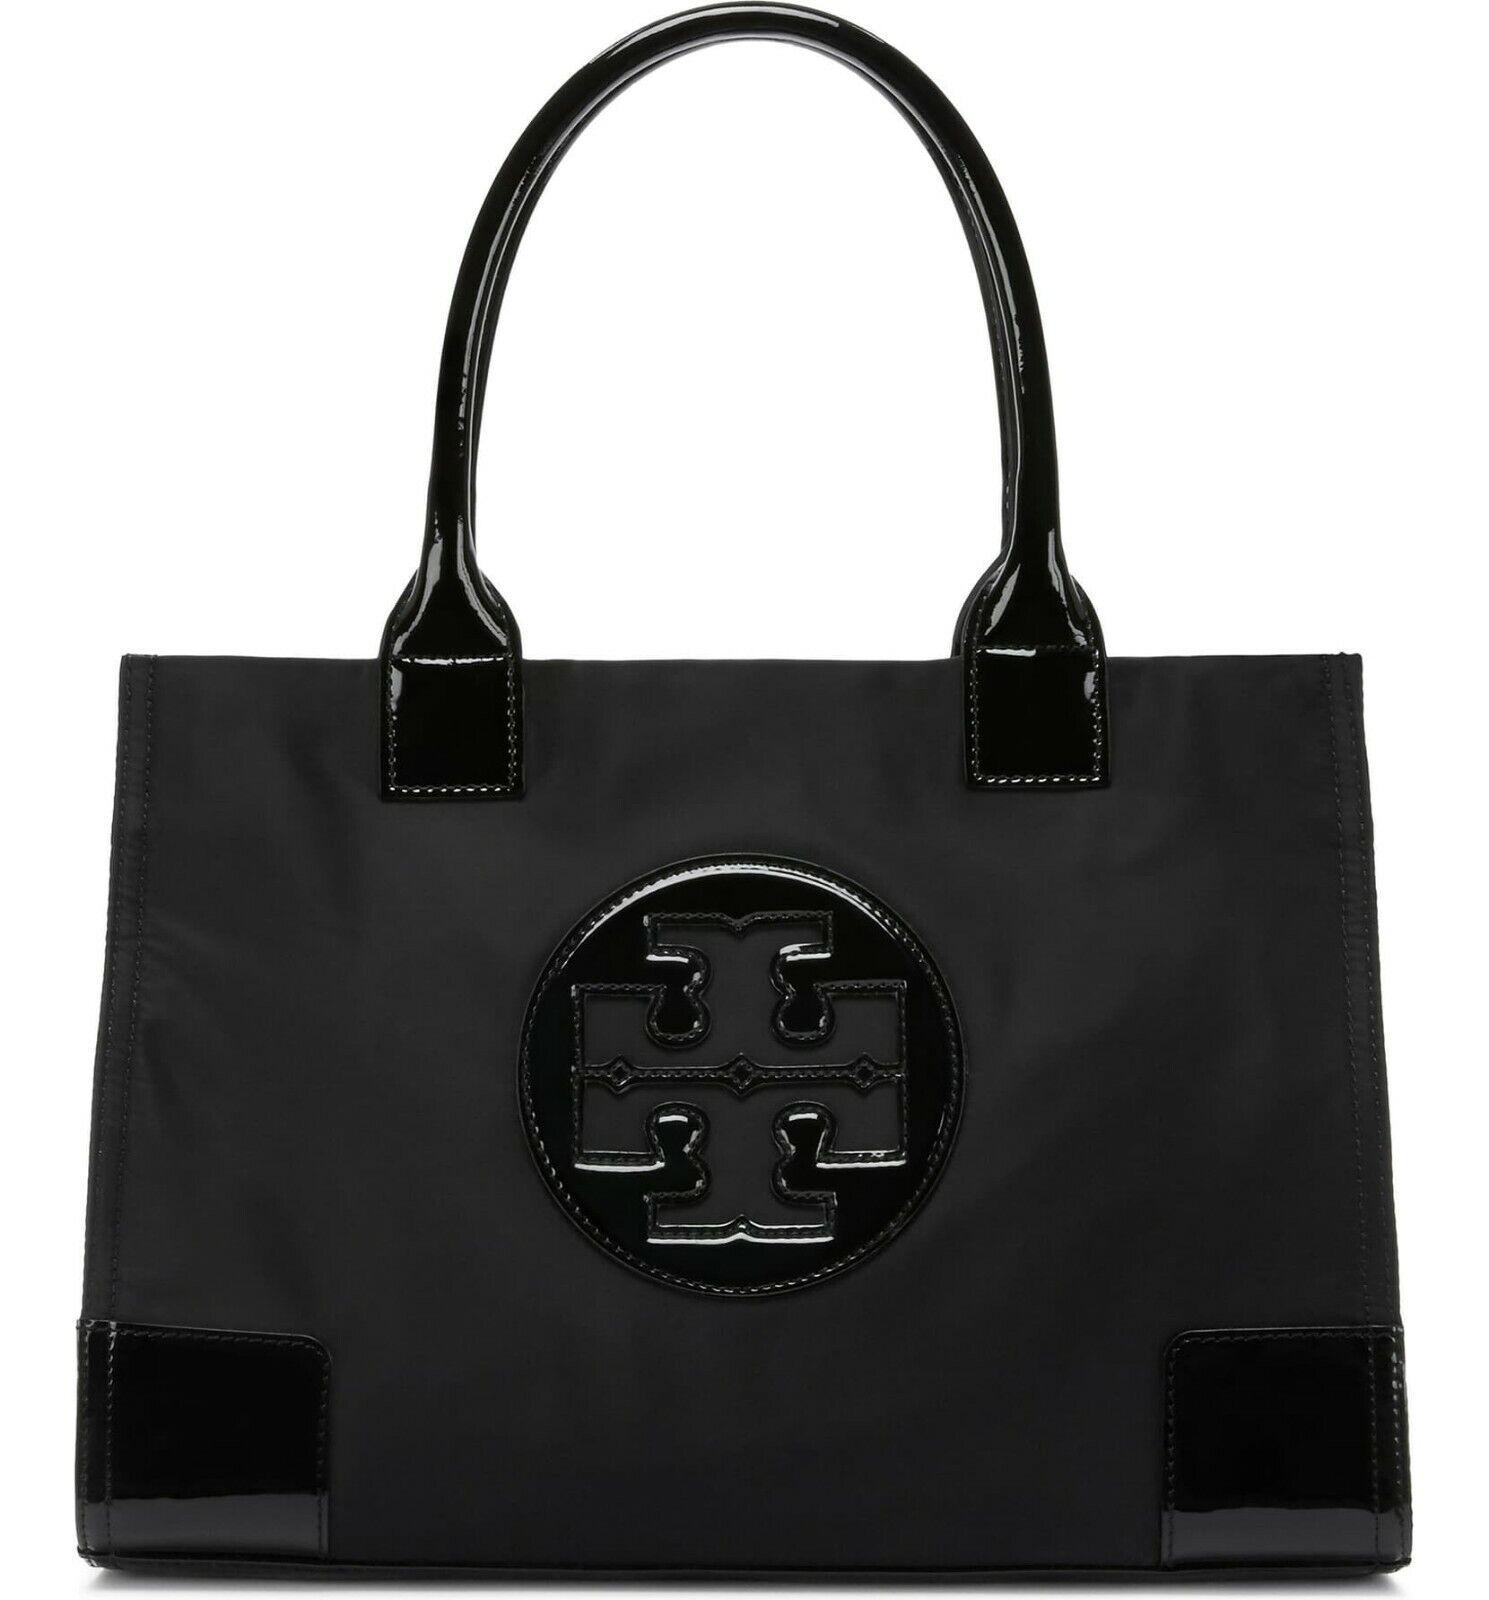 Tory Burch Women's Ella Mini Nylon Top-handle Bag Tote - Blackblack